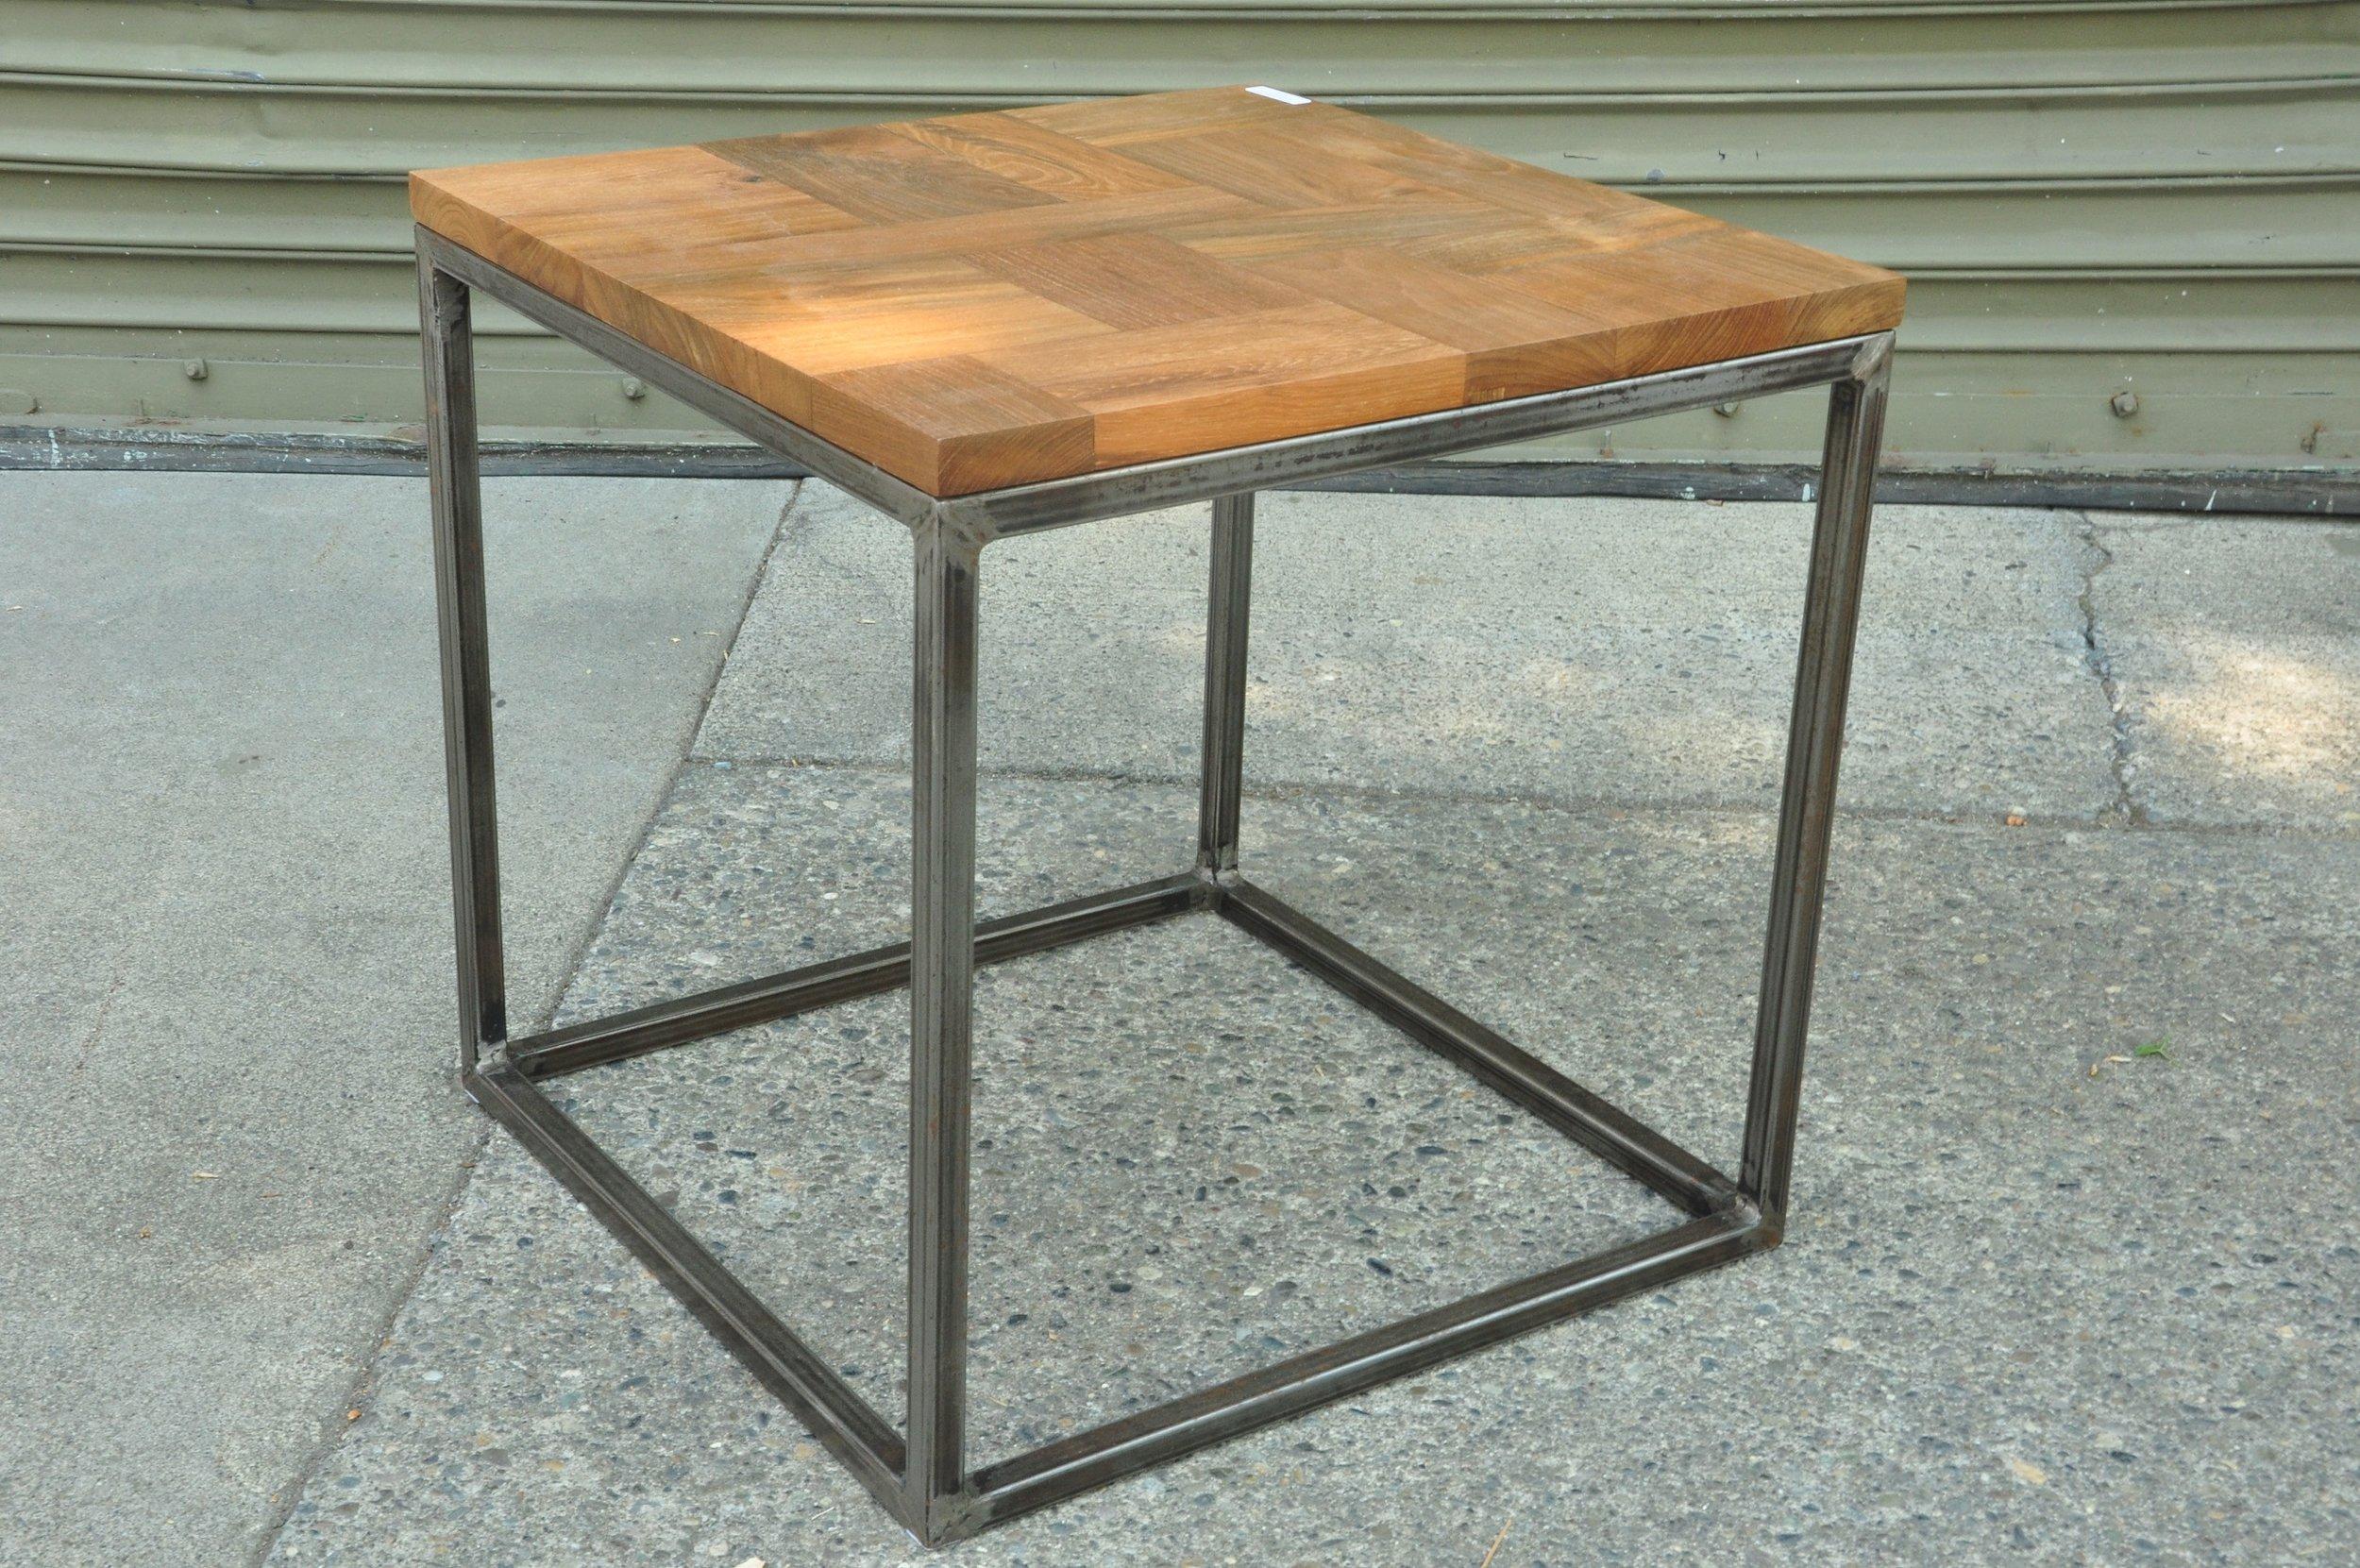 "Cube Teak Iron Side Table  14""W x 18""D x 16""H Price: $150  18""W x 18""D x 18""H Price: $160  20""W x 20""D x 21""H Price: $170"